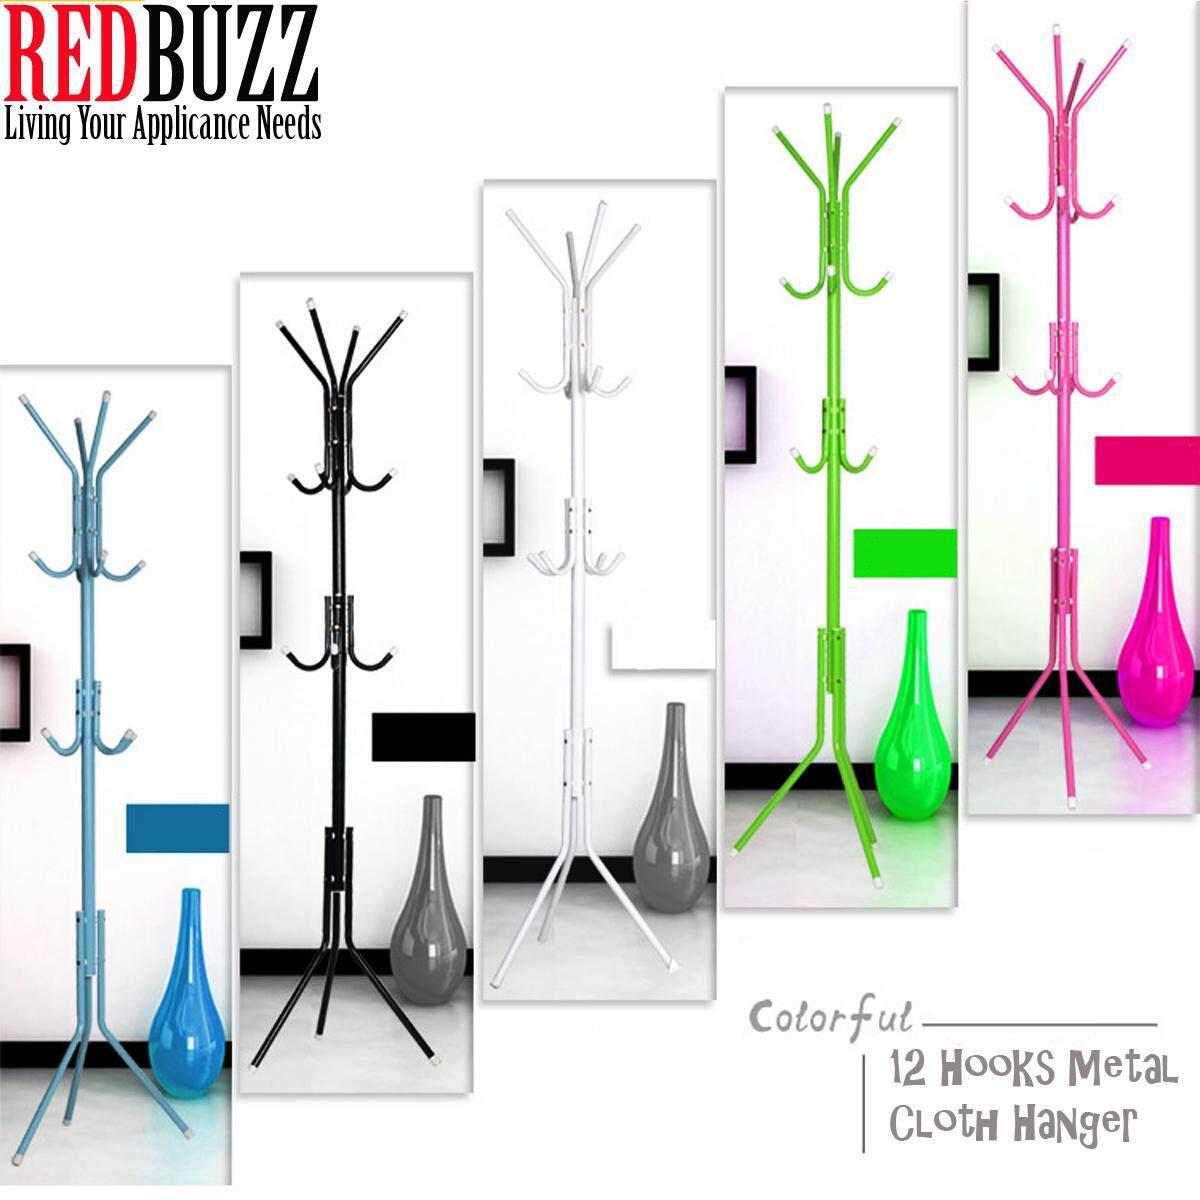 REDBUZZ 9 Hooks /12 Hooks Metal Cloth Hanger Multi Purpose Hanging Pole Stand Cloth Rack